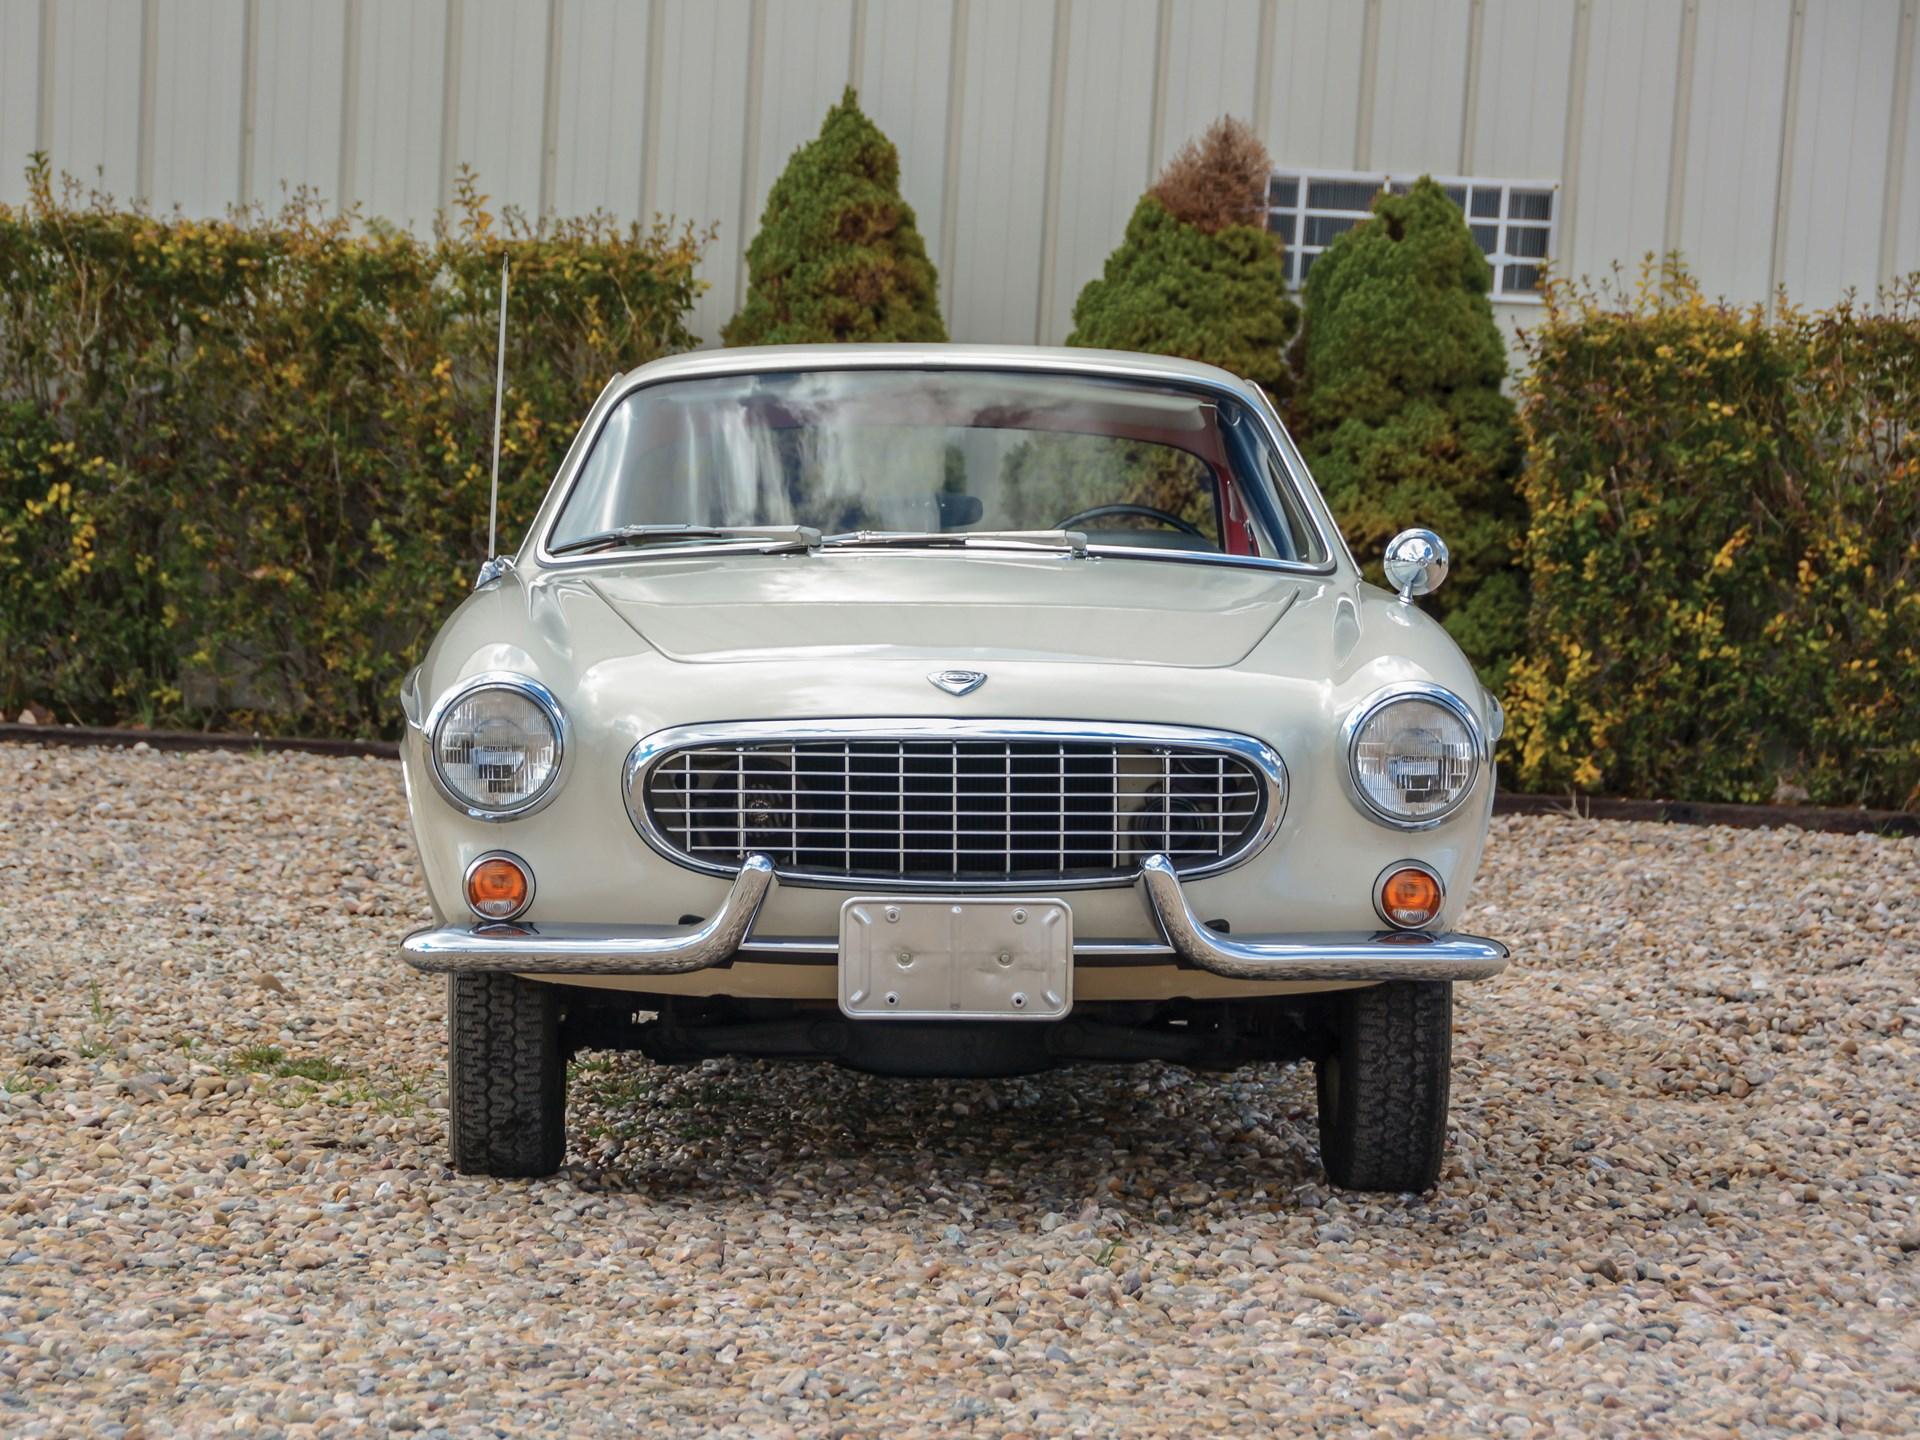 1965 Volvo 1800S front